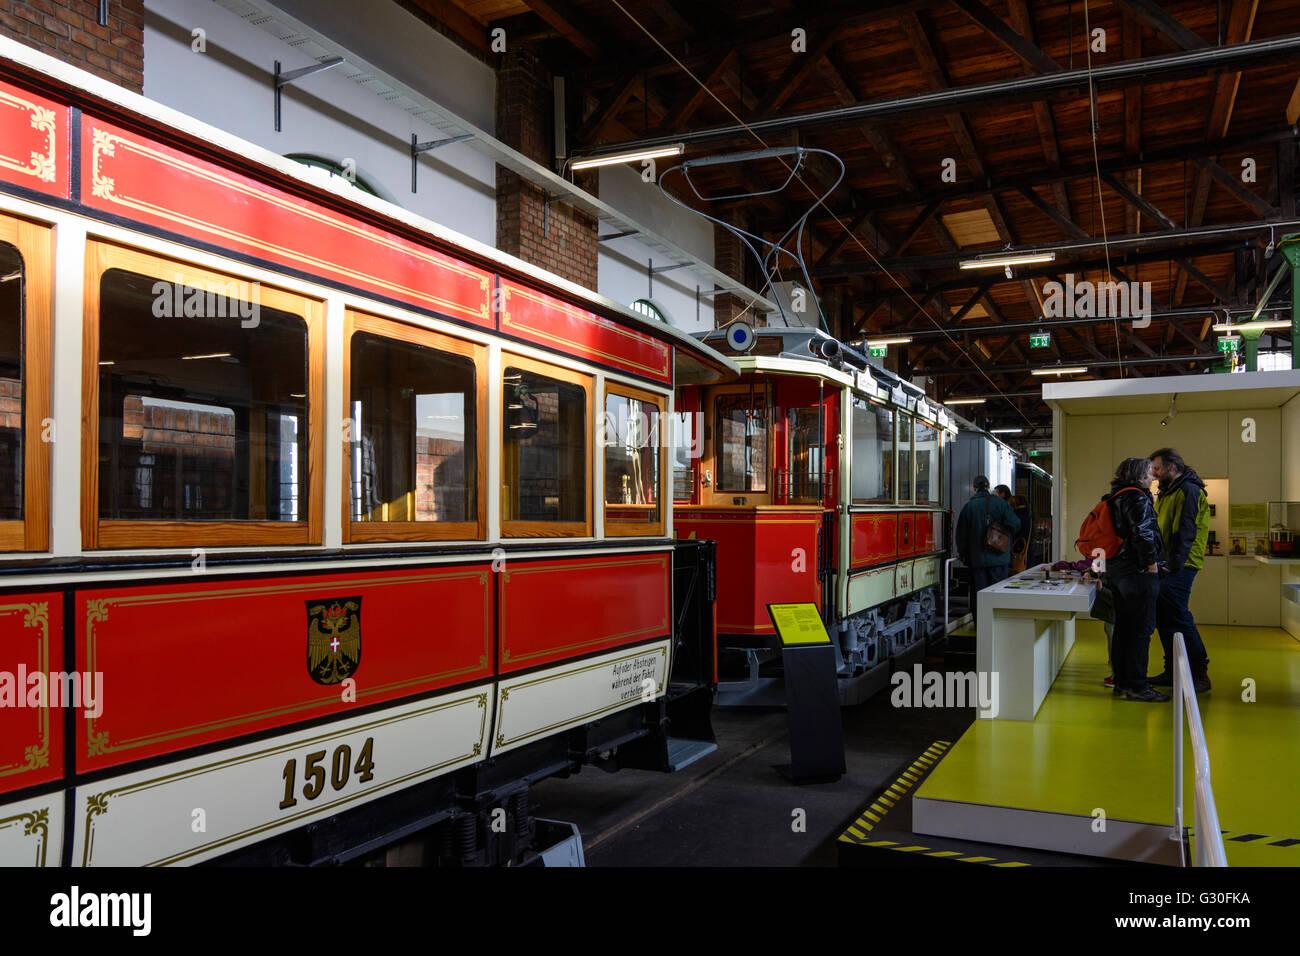 Transport Museum depot Wiener Linien : vintage trams, Austria, Wien 03., Wien, Vienna - Stock Image